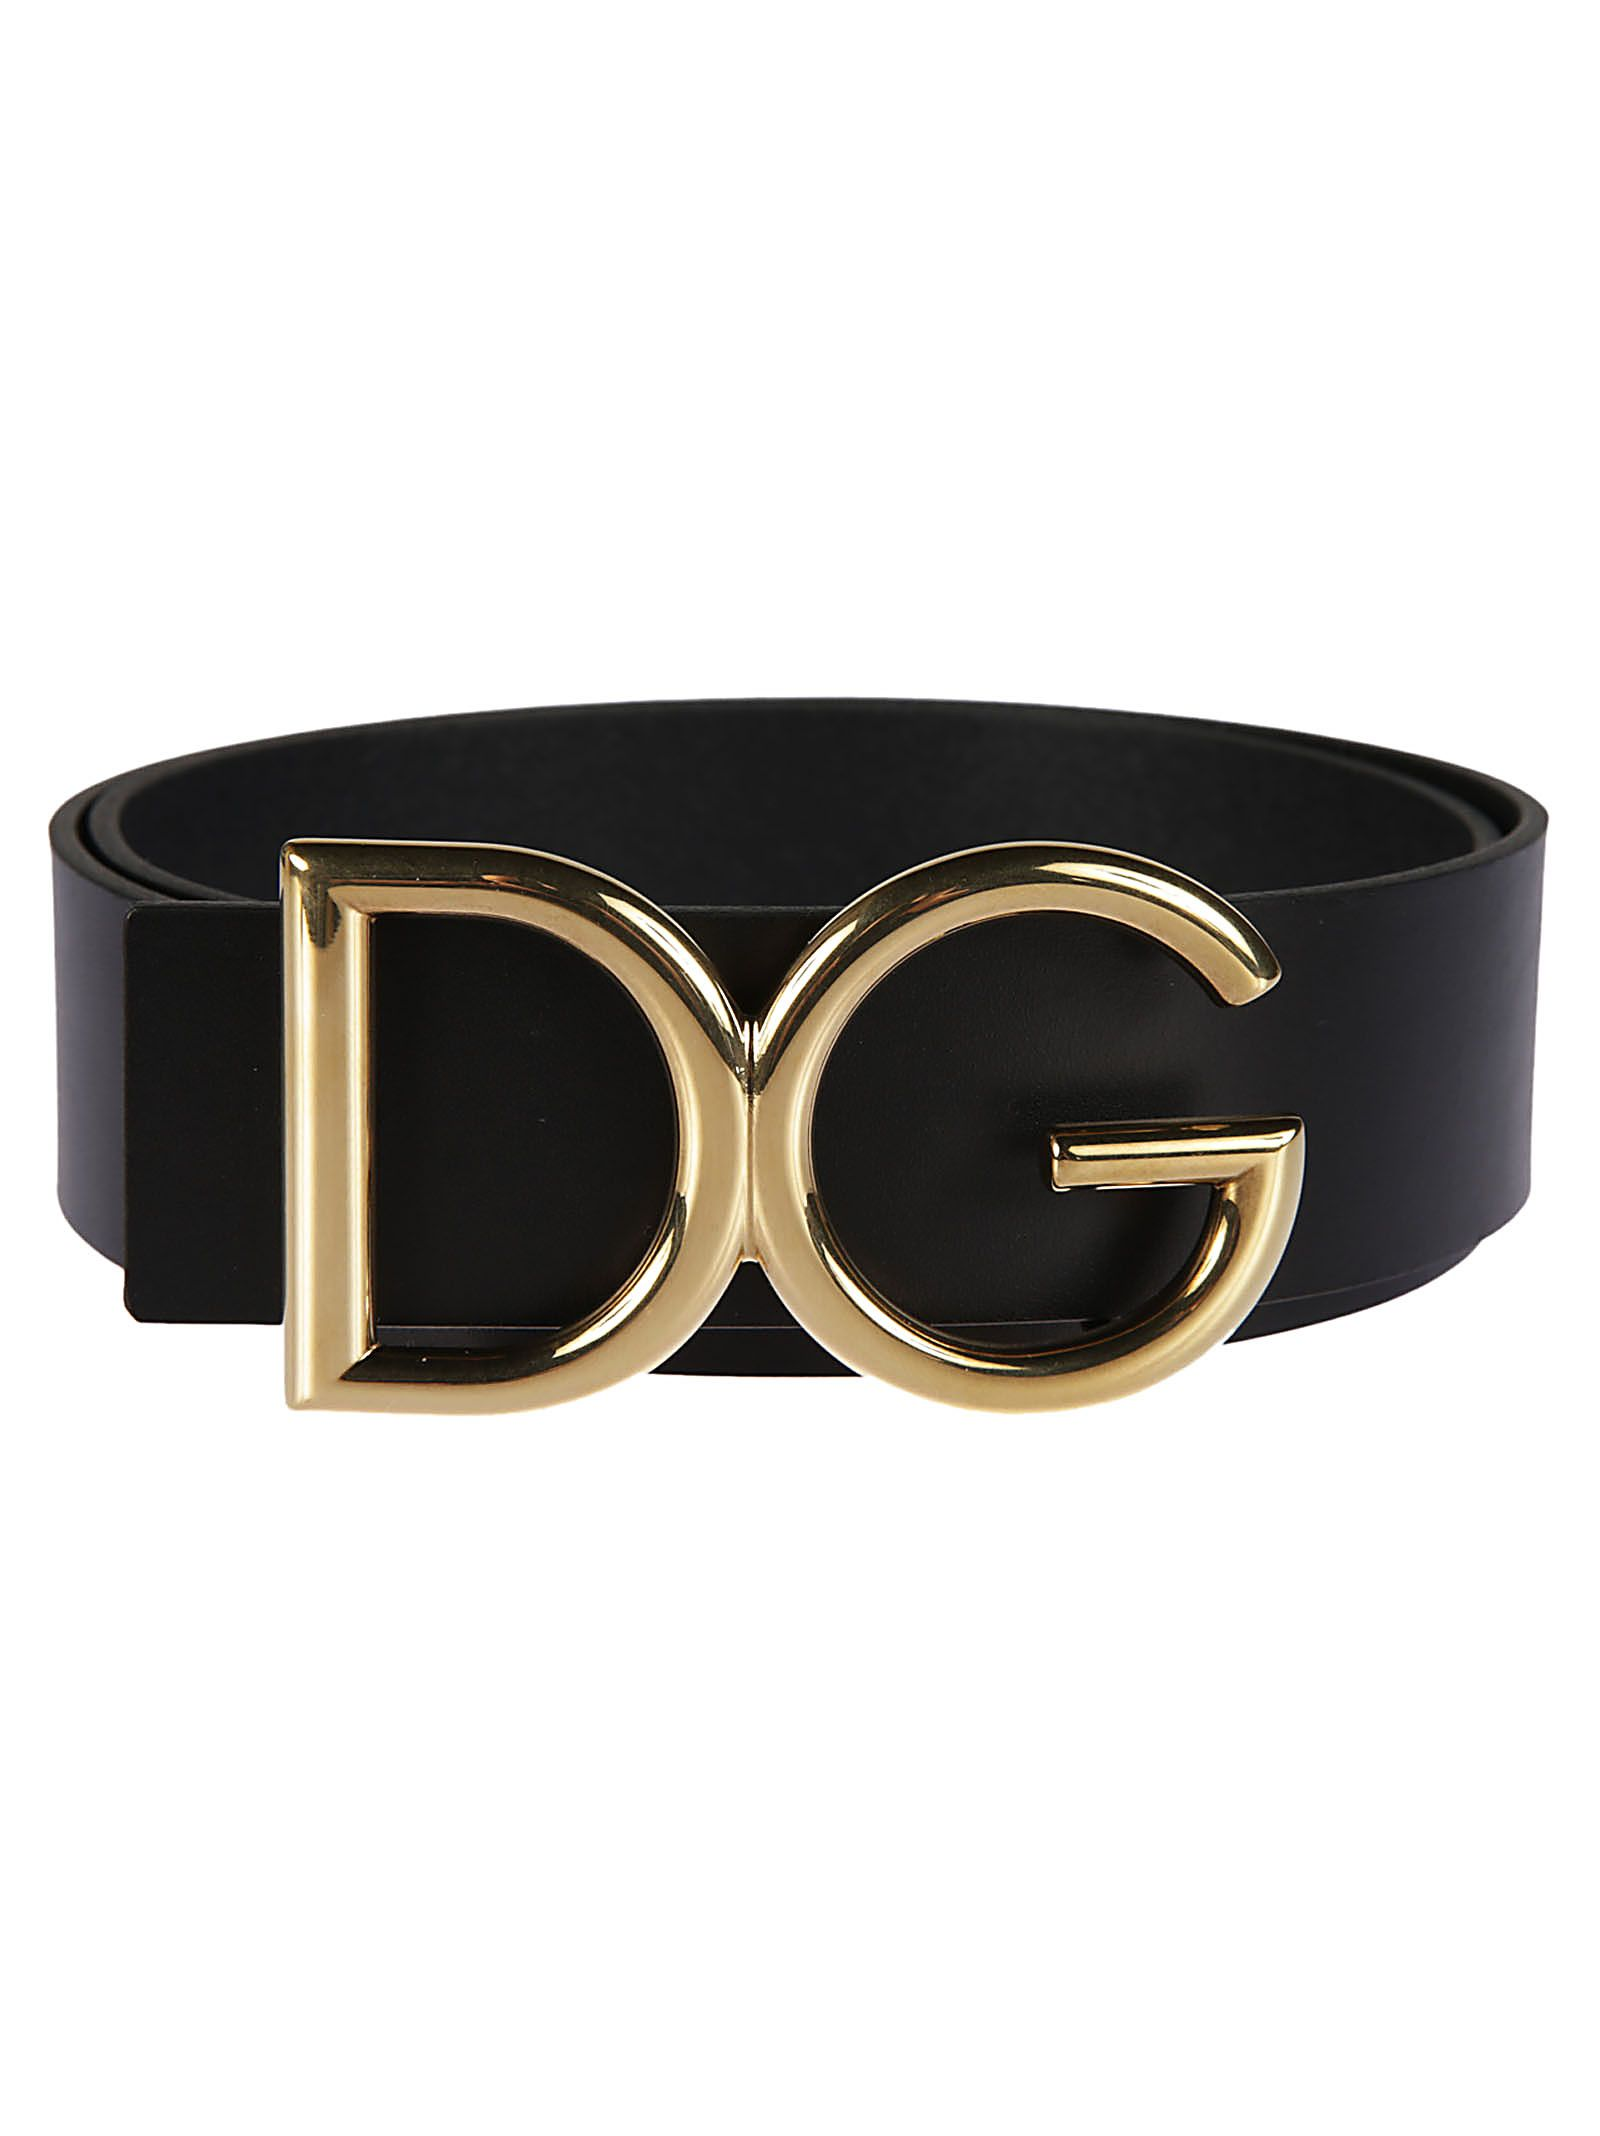 5501ee3a84 ... australia dolce gabbana logo belt black ed9ff db5f3